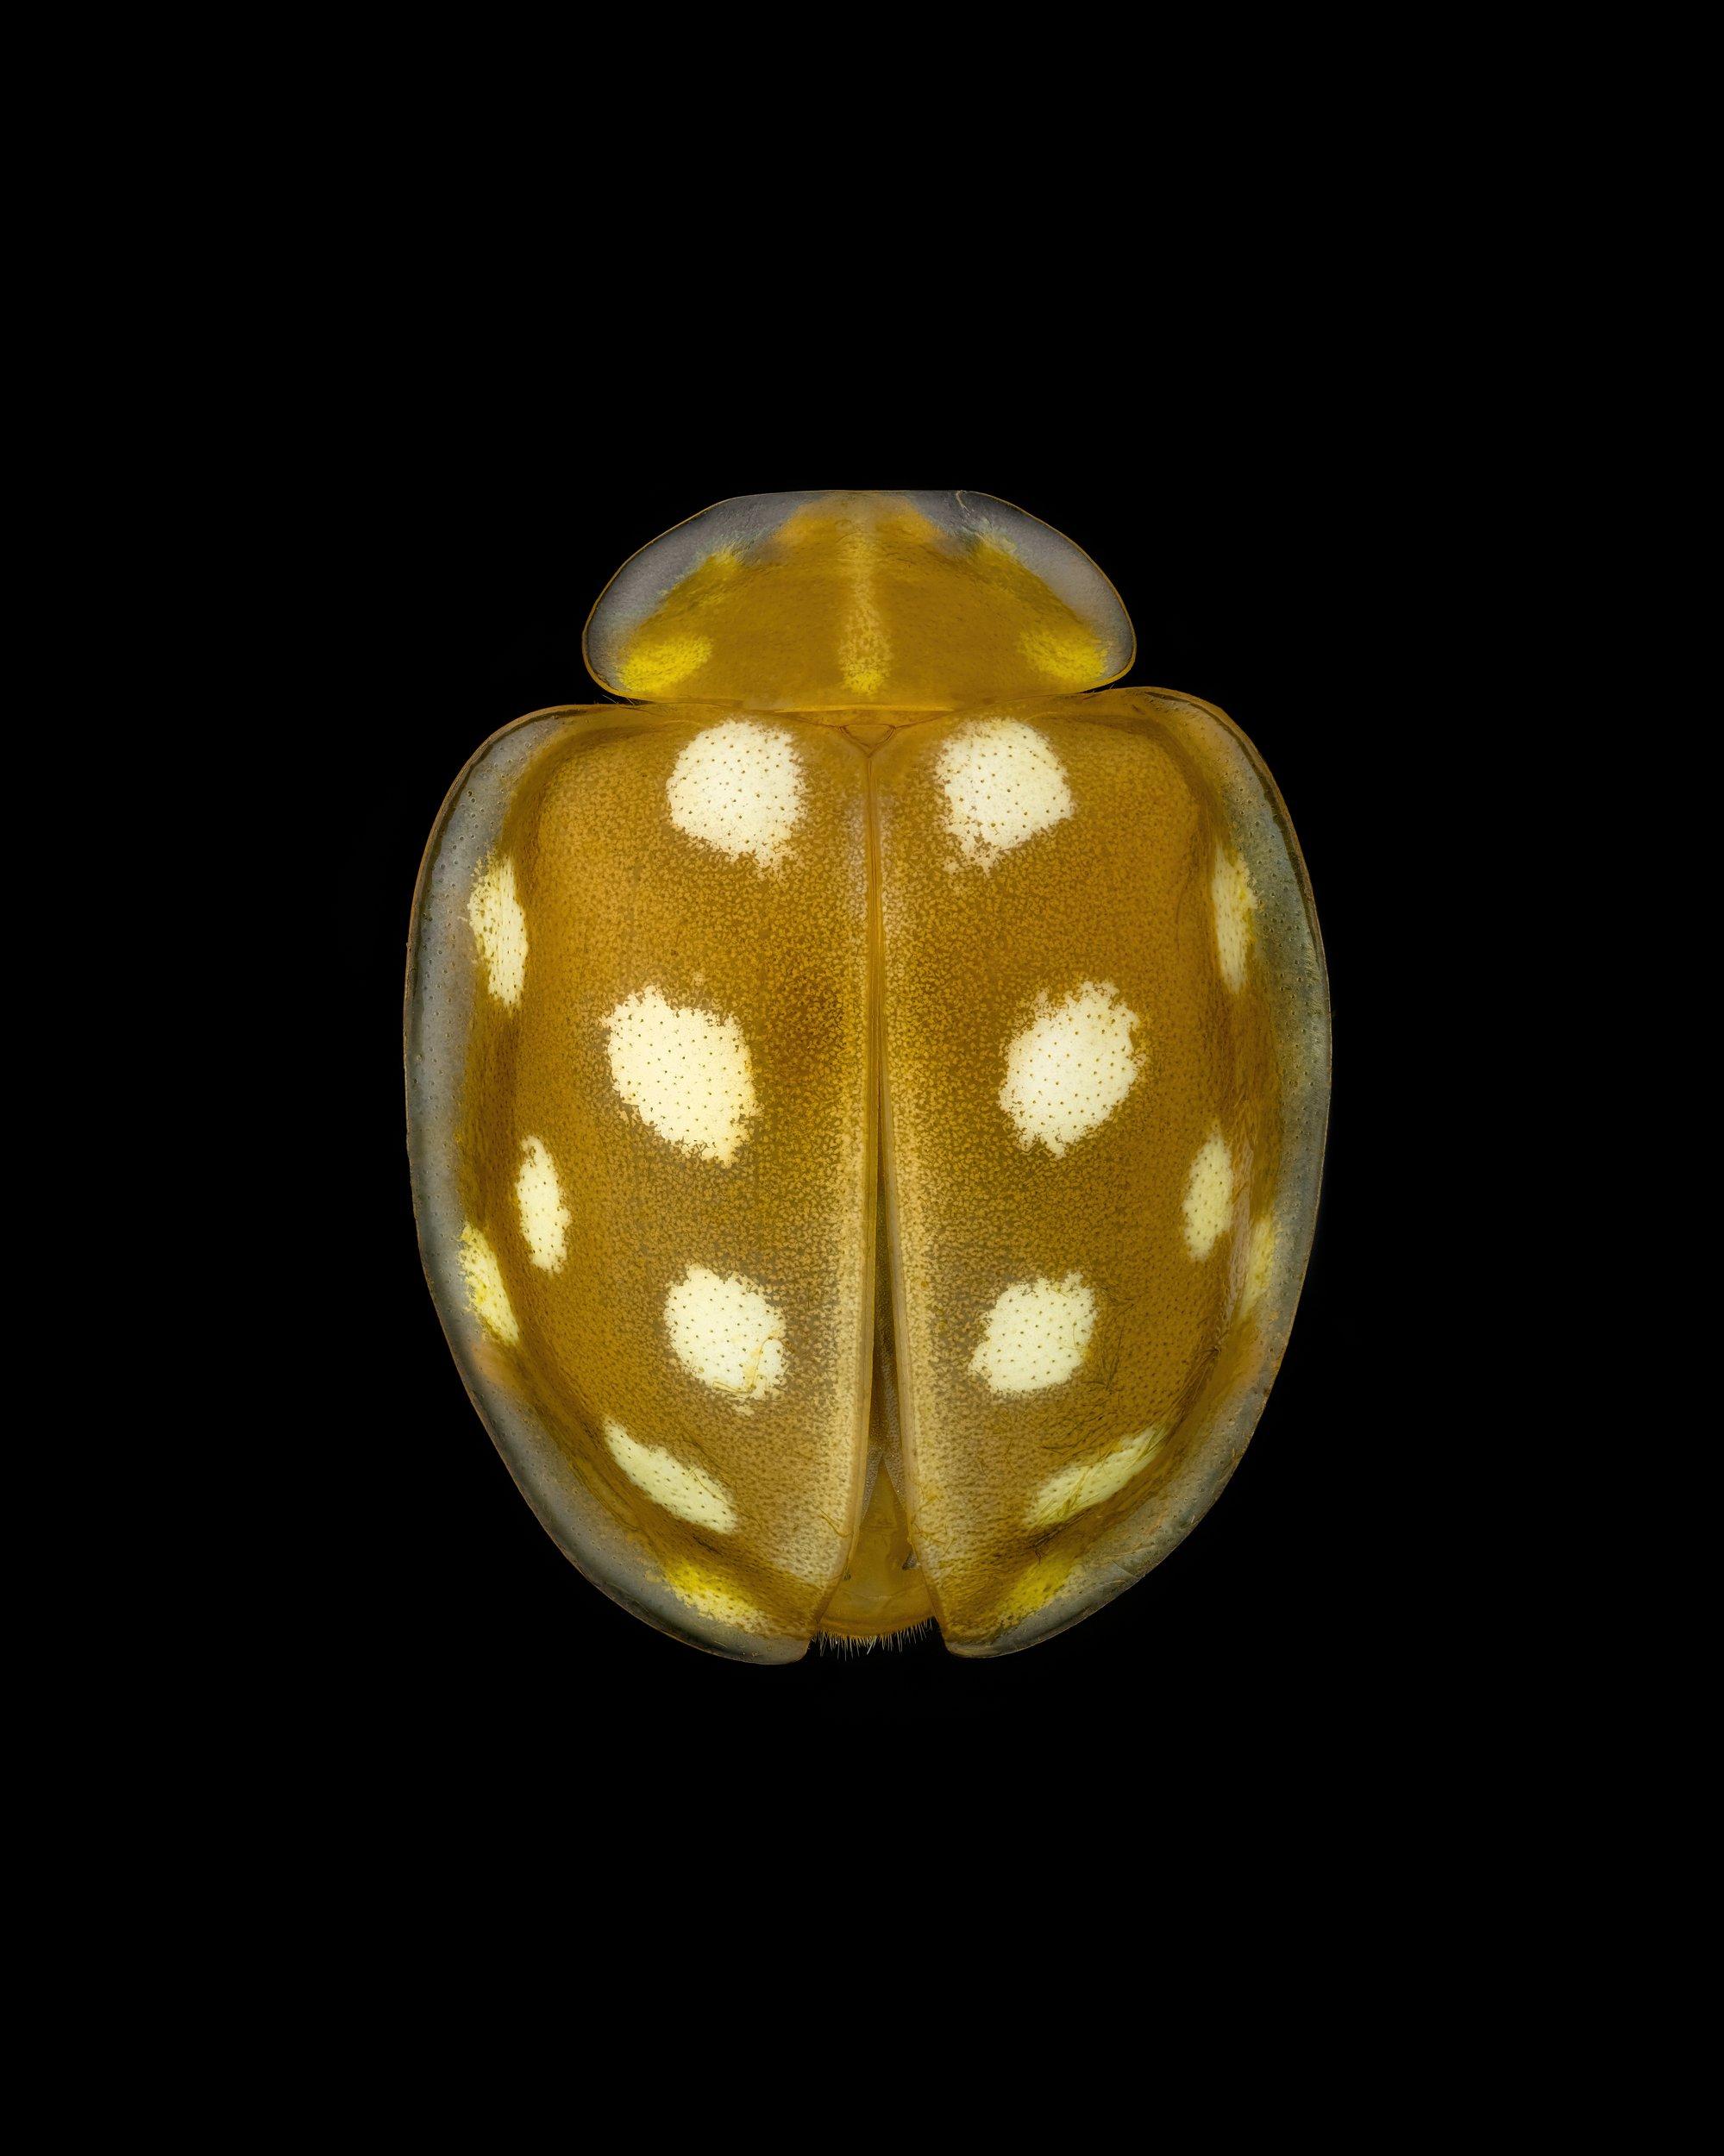 macro extrememacro insect, Орленко Антон